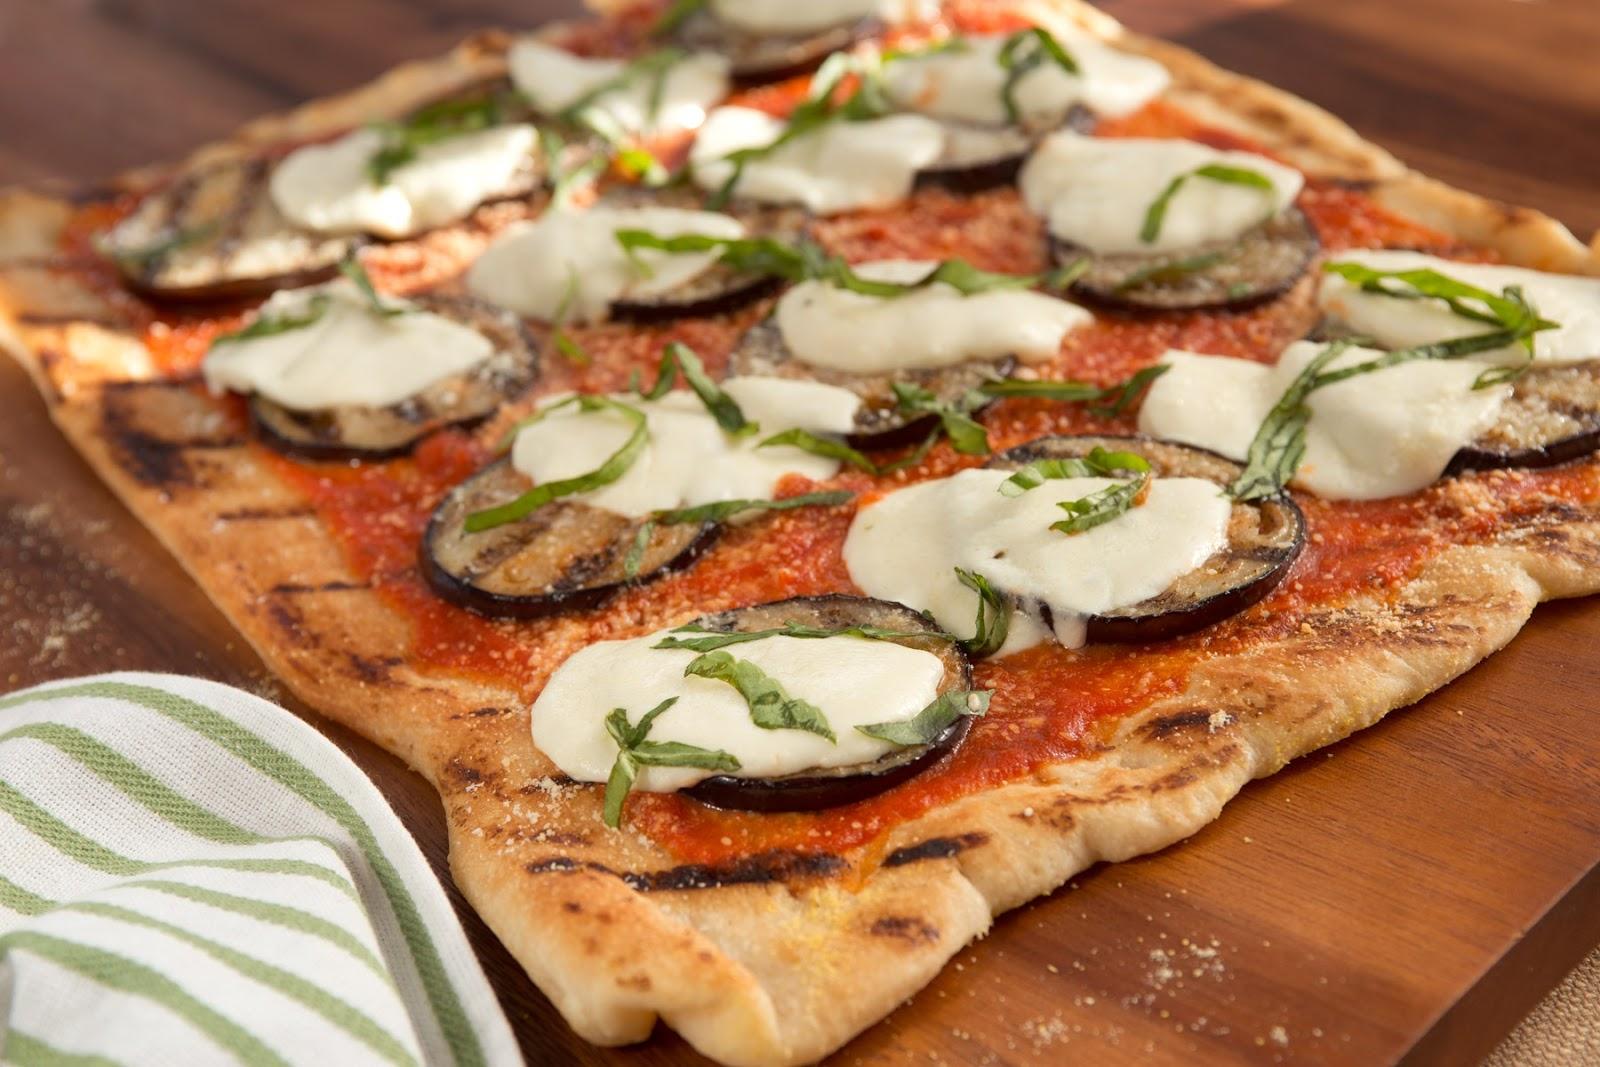 Meals, Heels, and Cocktails: Grilled Eggplant Parmesan Pizza